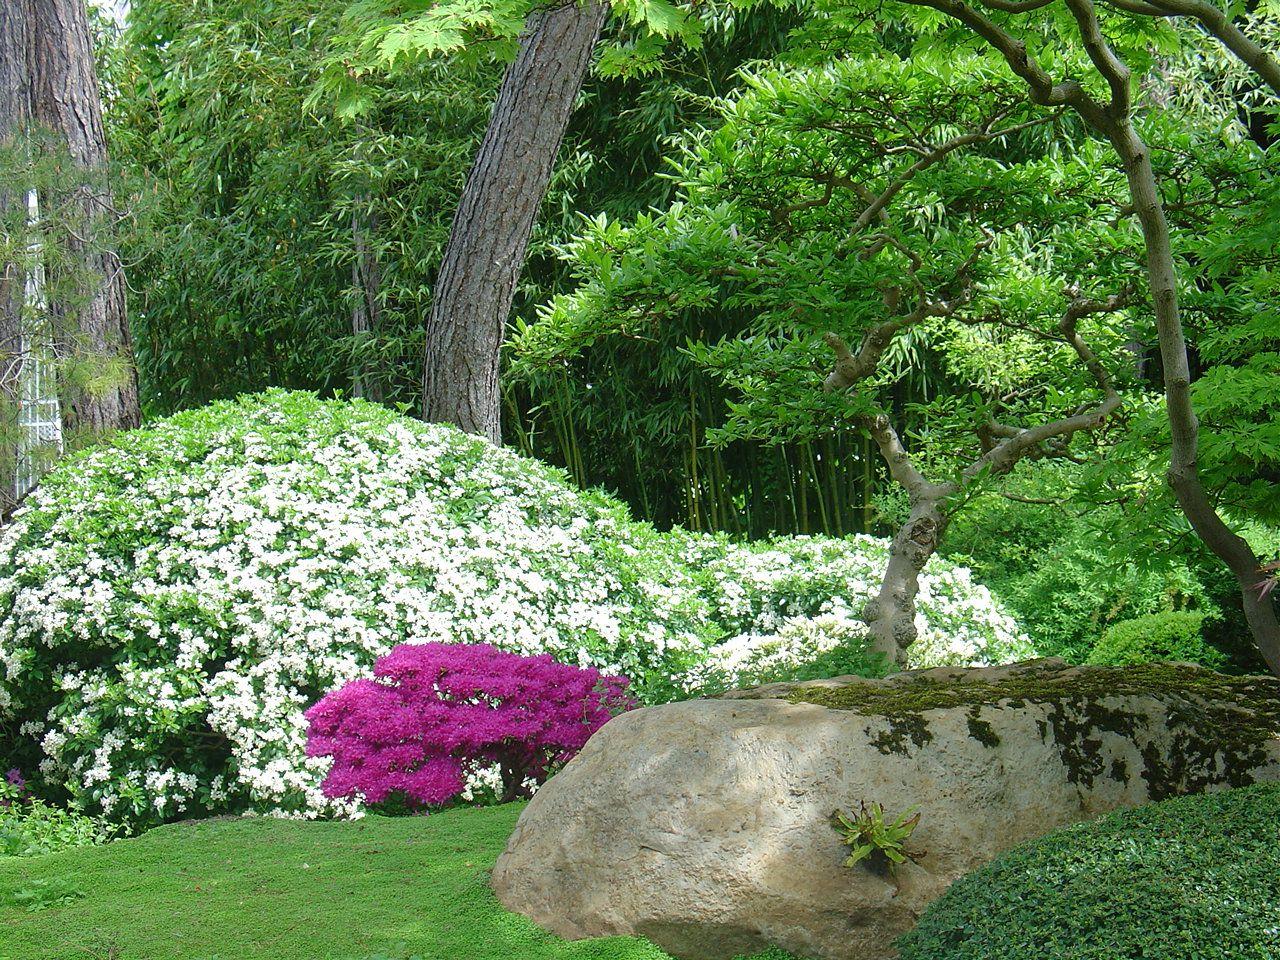 Jardins japonais le jardin albert kahn for Albert kahn jardin